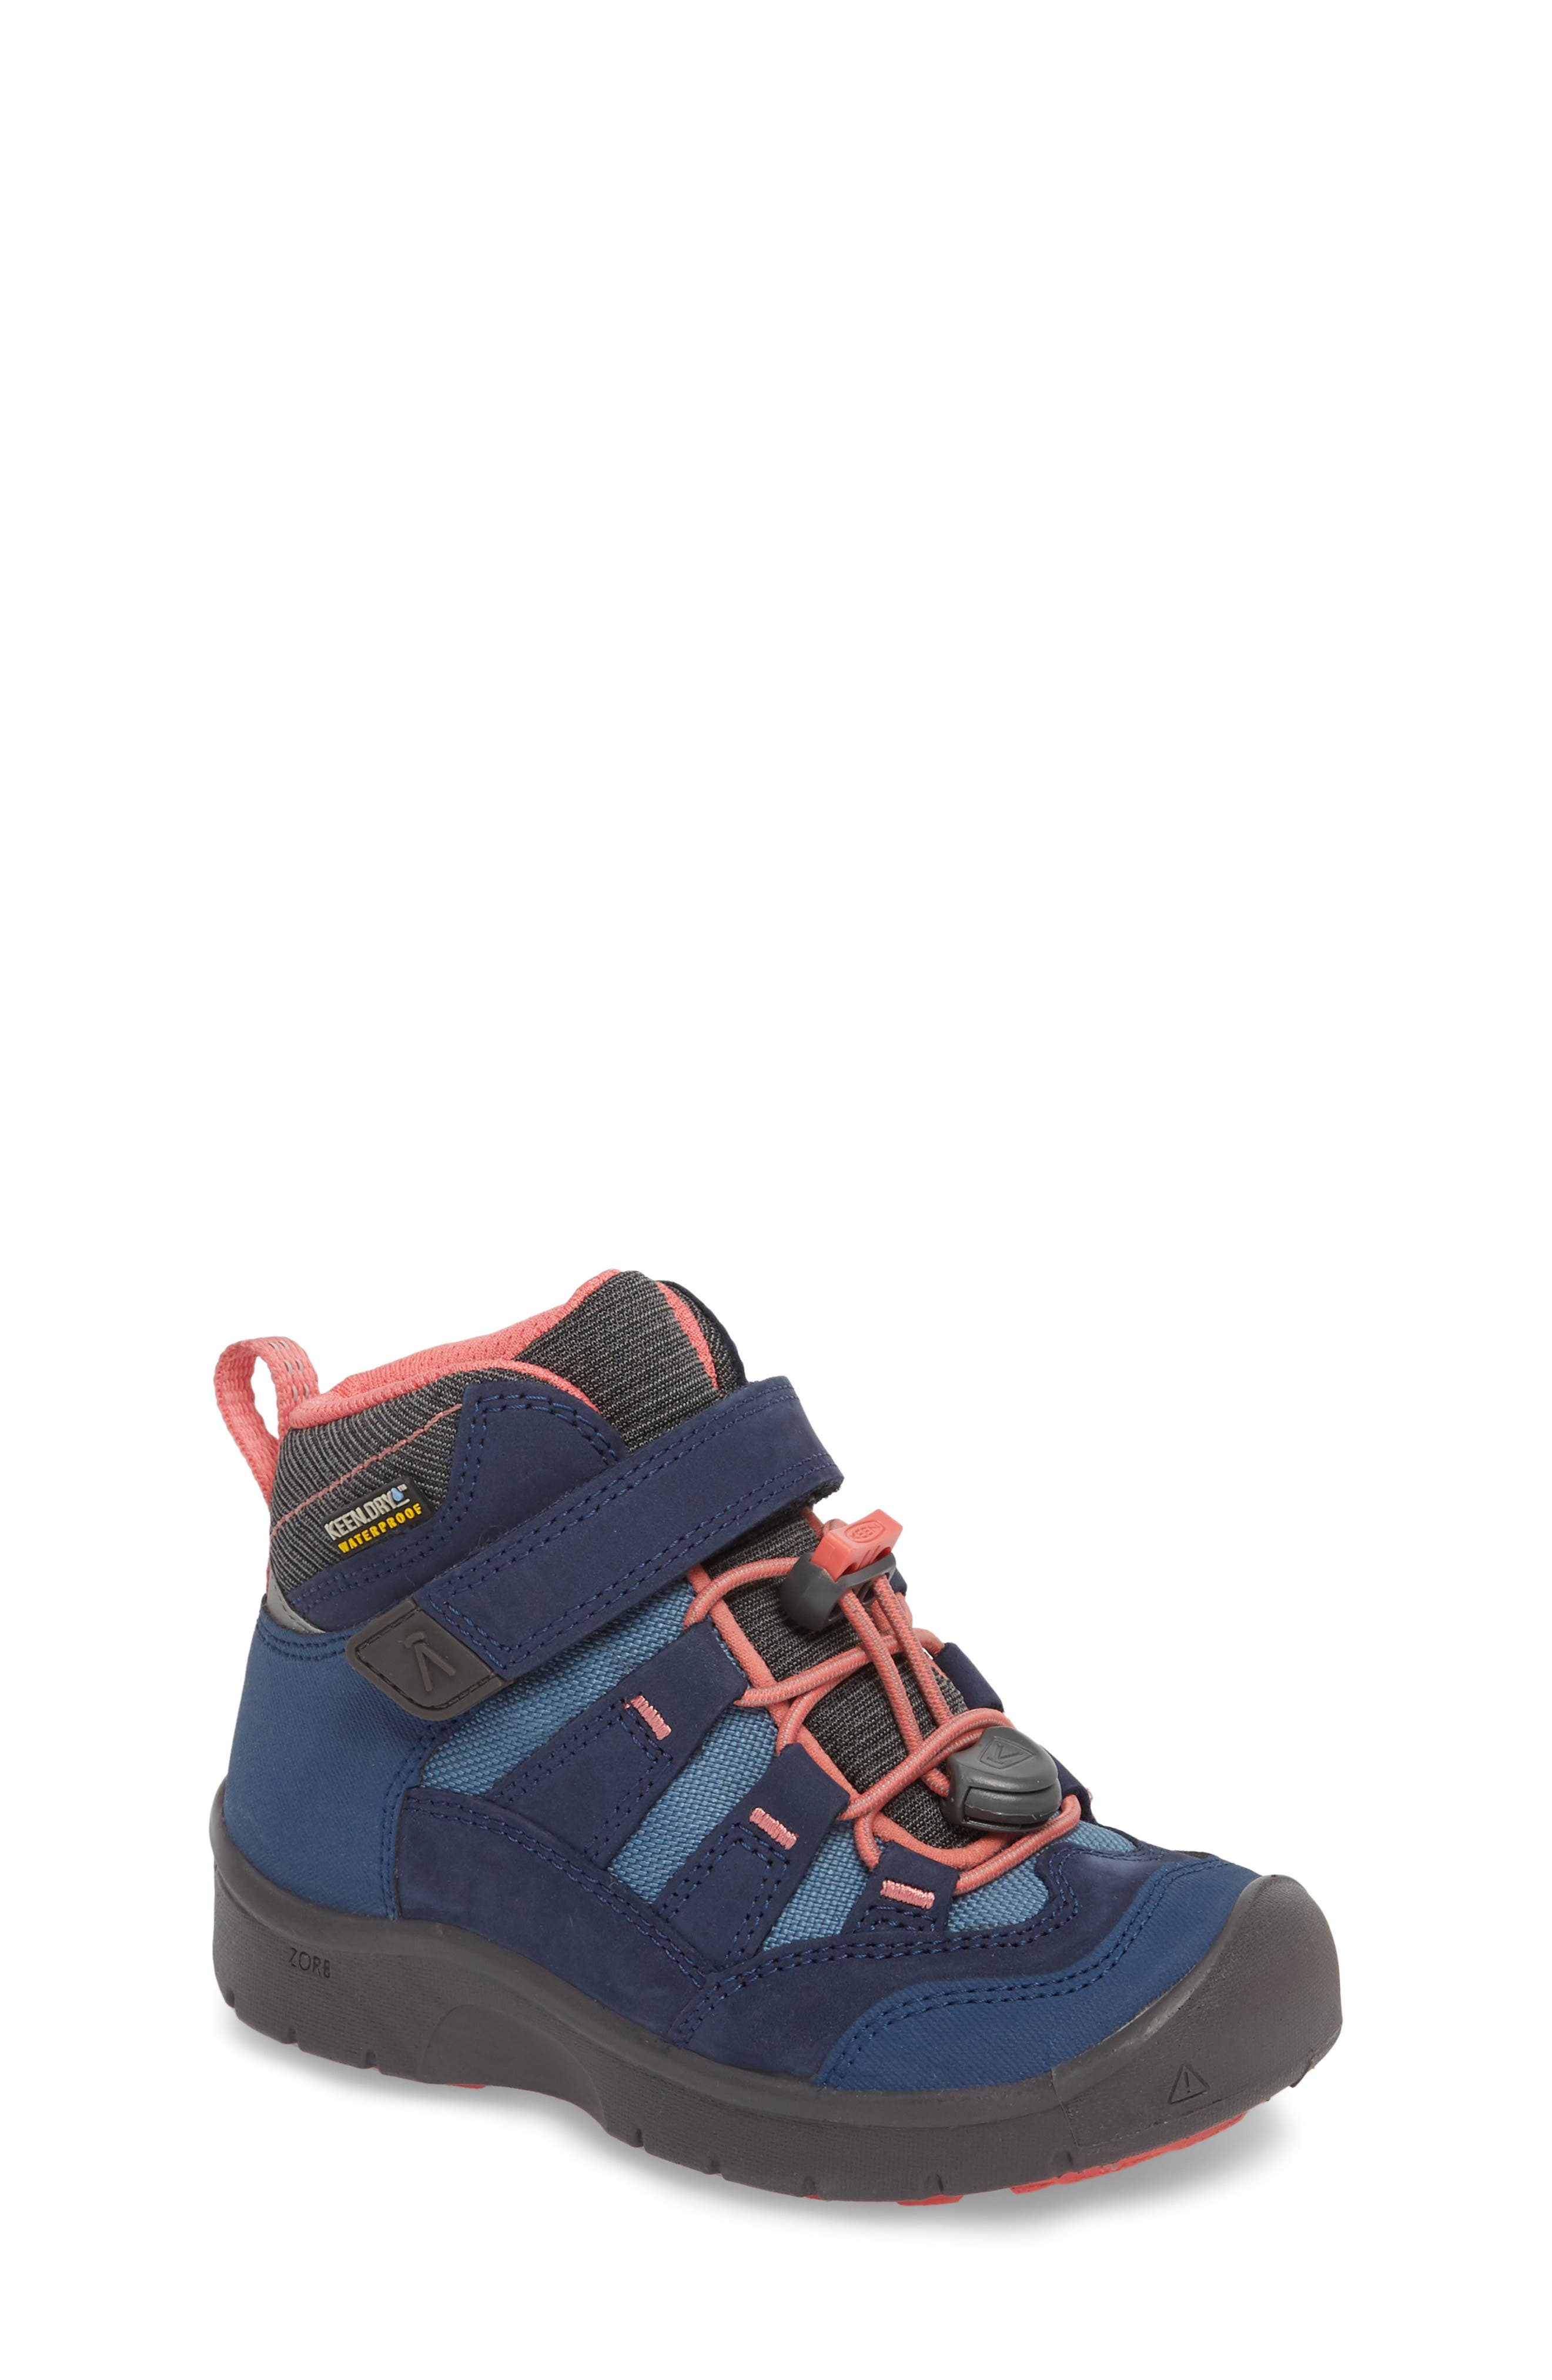 Hikeport Strap Waterproof Mid Boot,                             Main thumbnail 4, color,